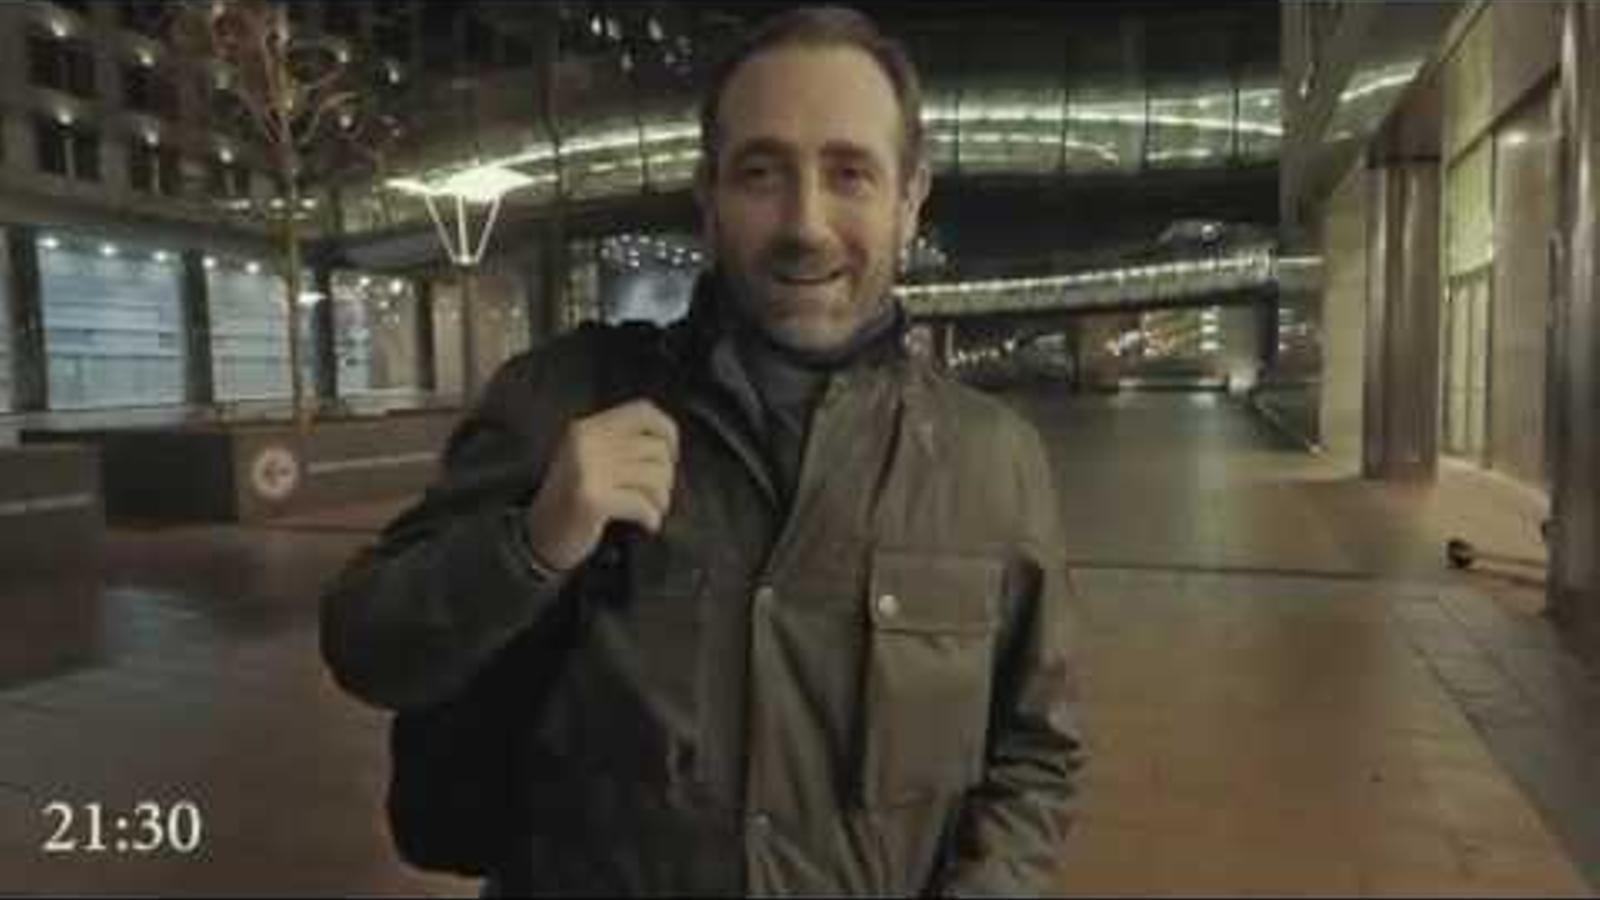 Primer vídeo de José Ramón Bauzá com a youtuber